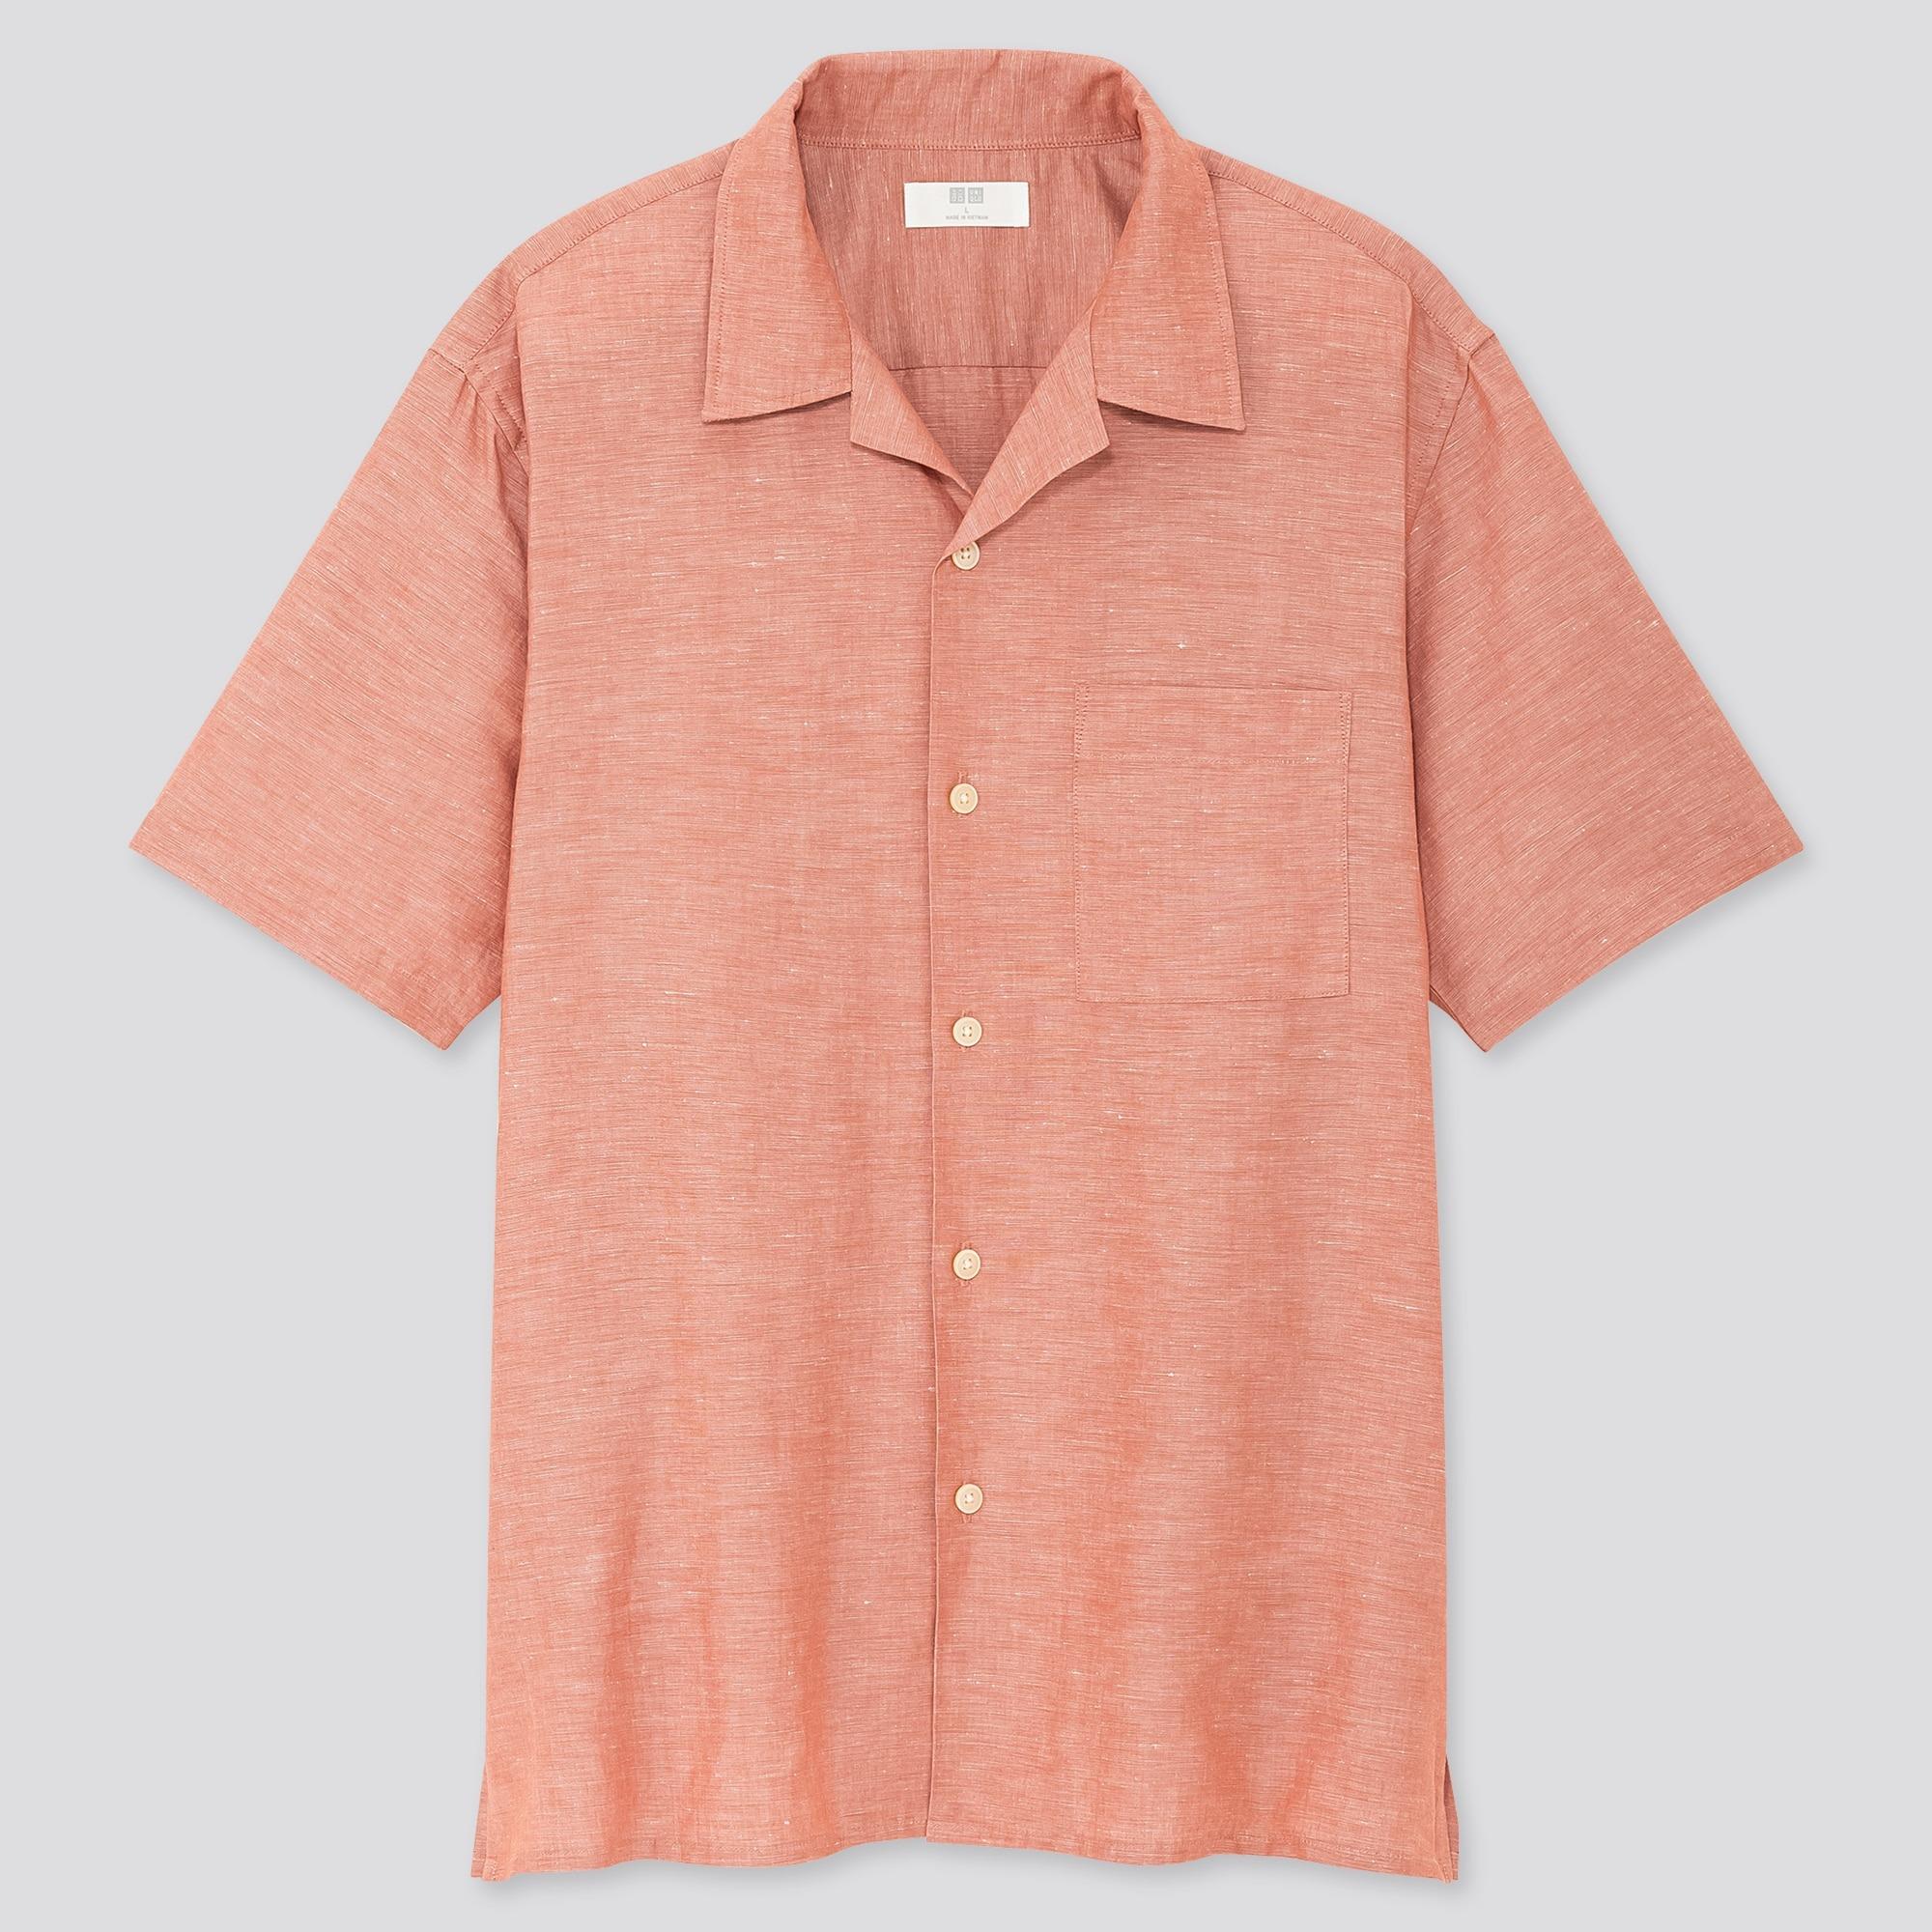 Uniqlo Short Sleeve Button Down Shirt